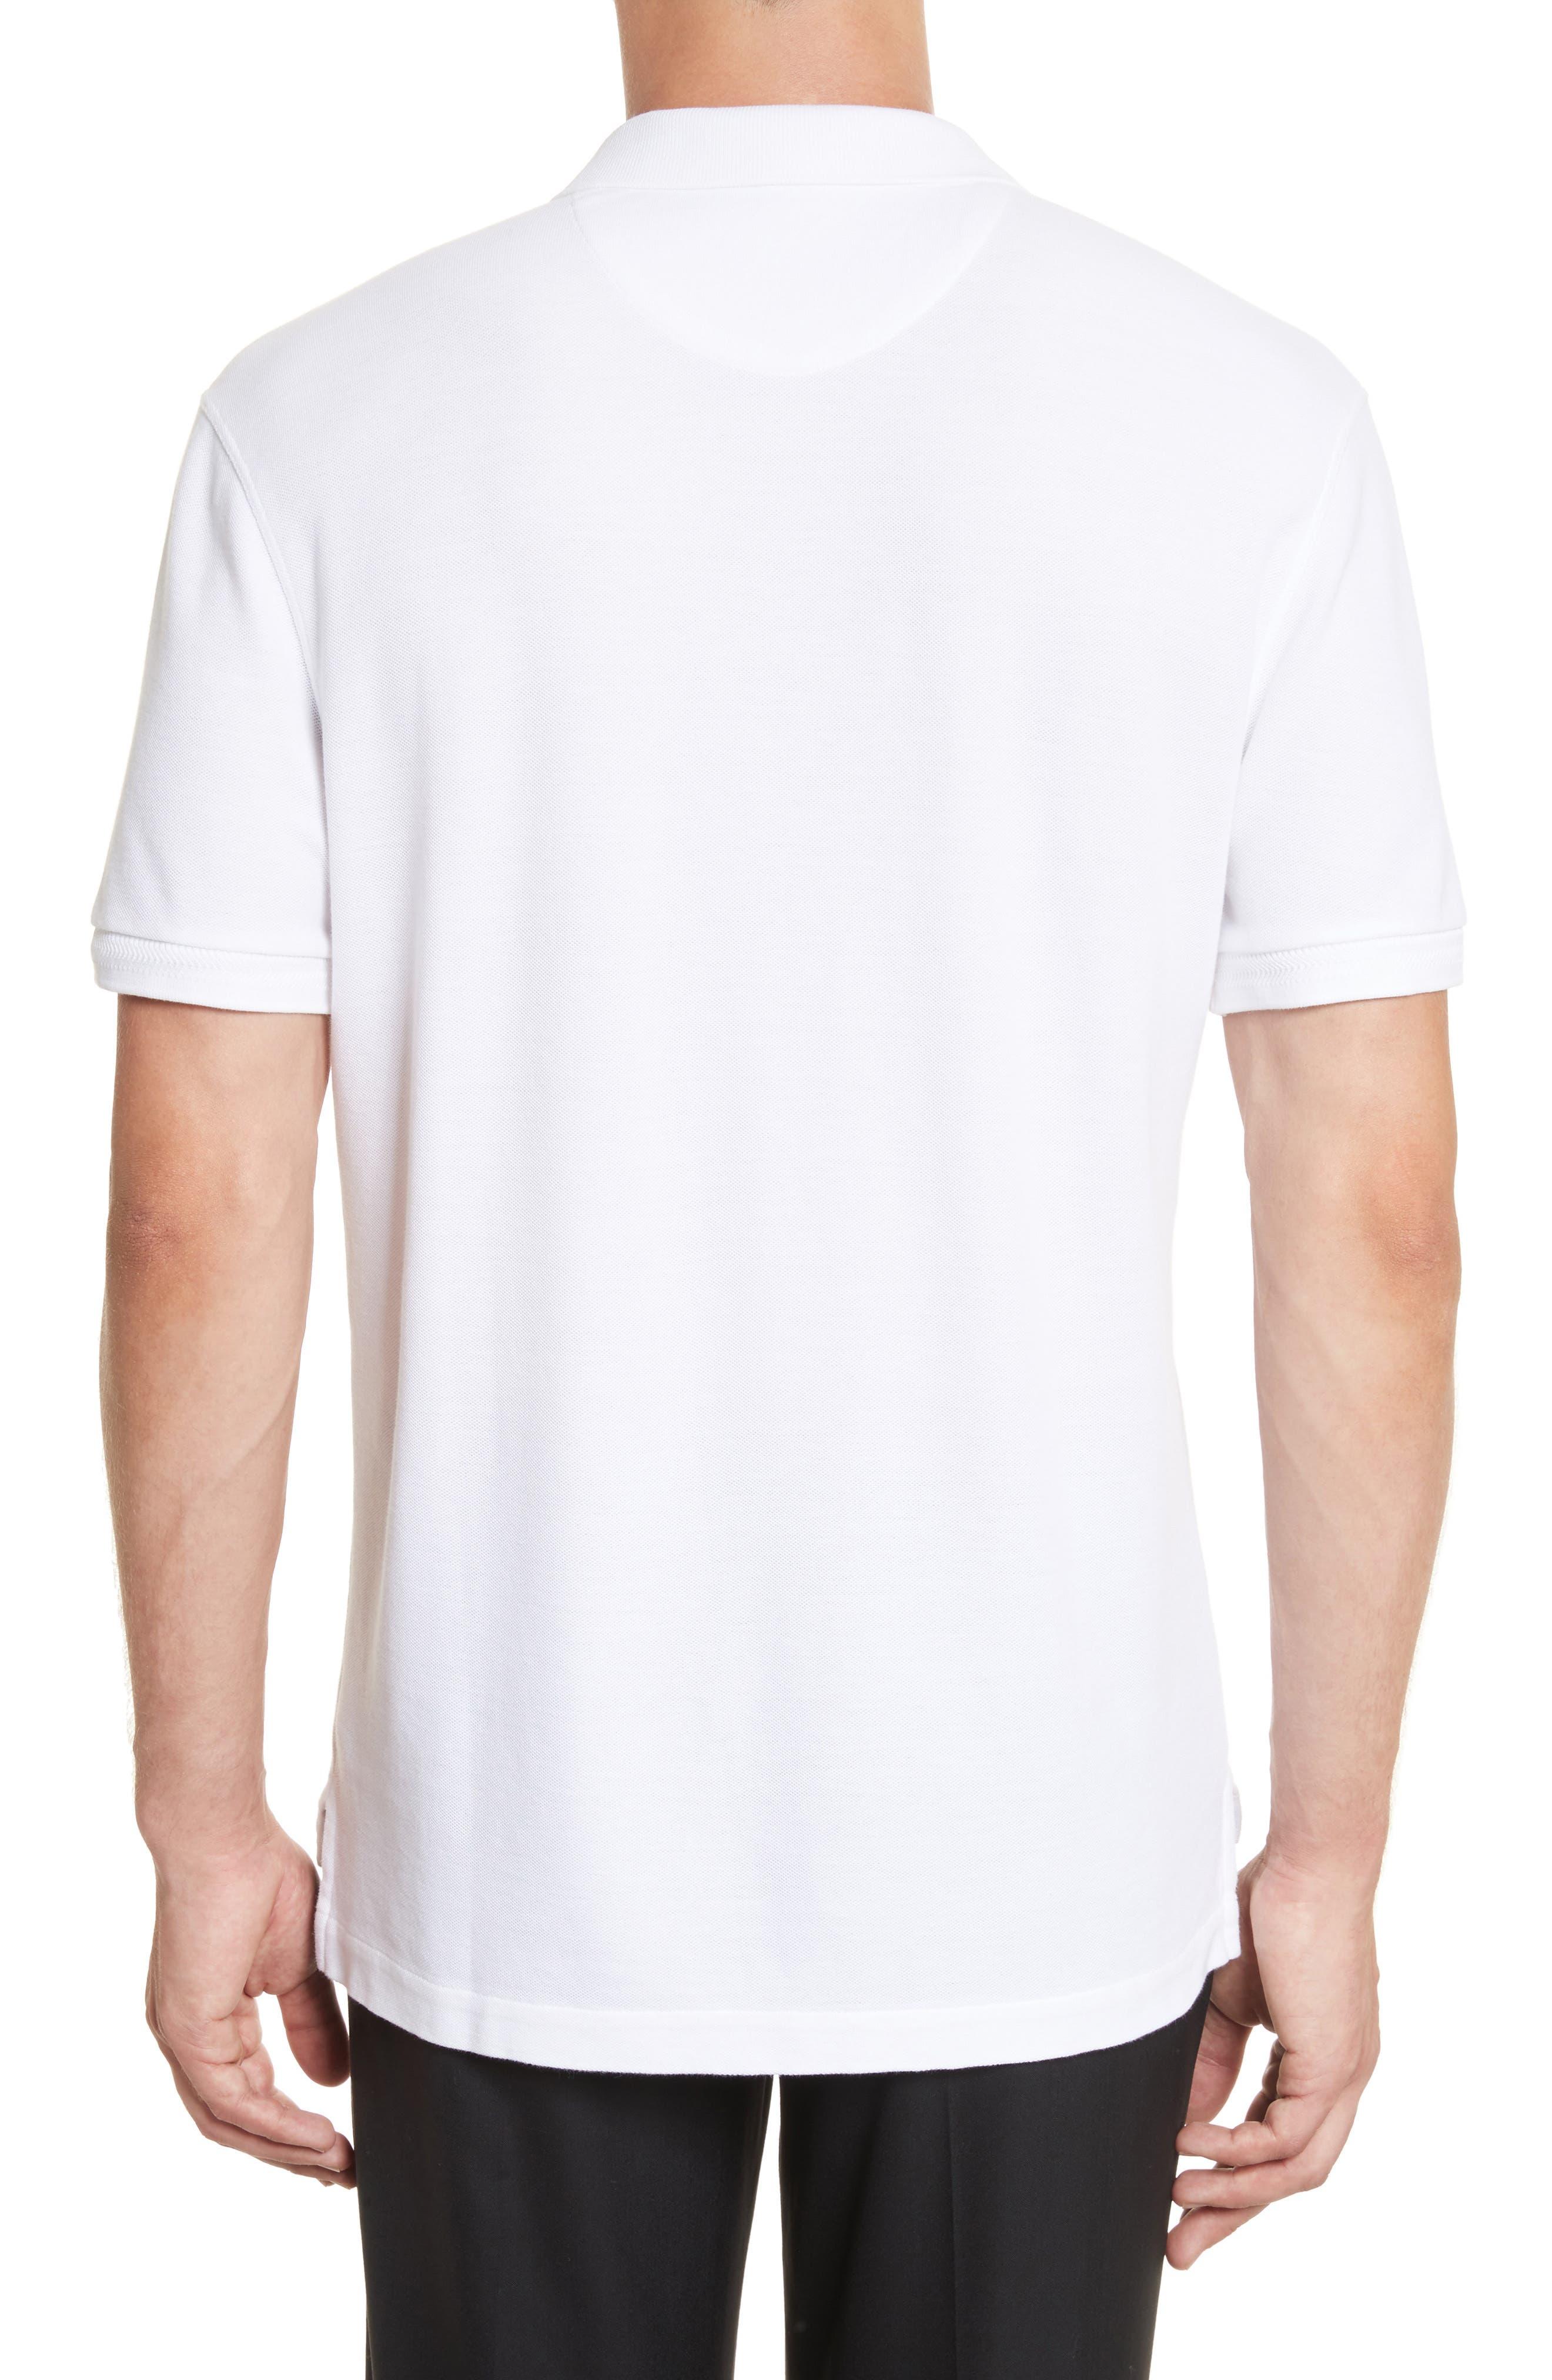 Alternate Image 2  - ATM Anthony Thomas Melillo Stitched Collar Cotton Piqué Polo